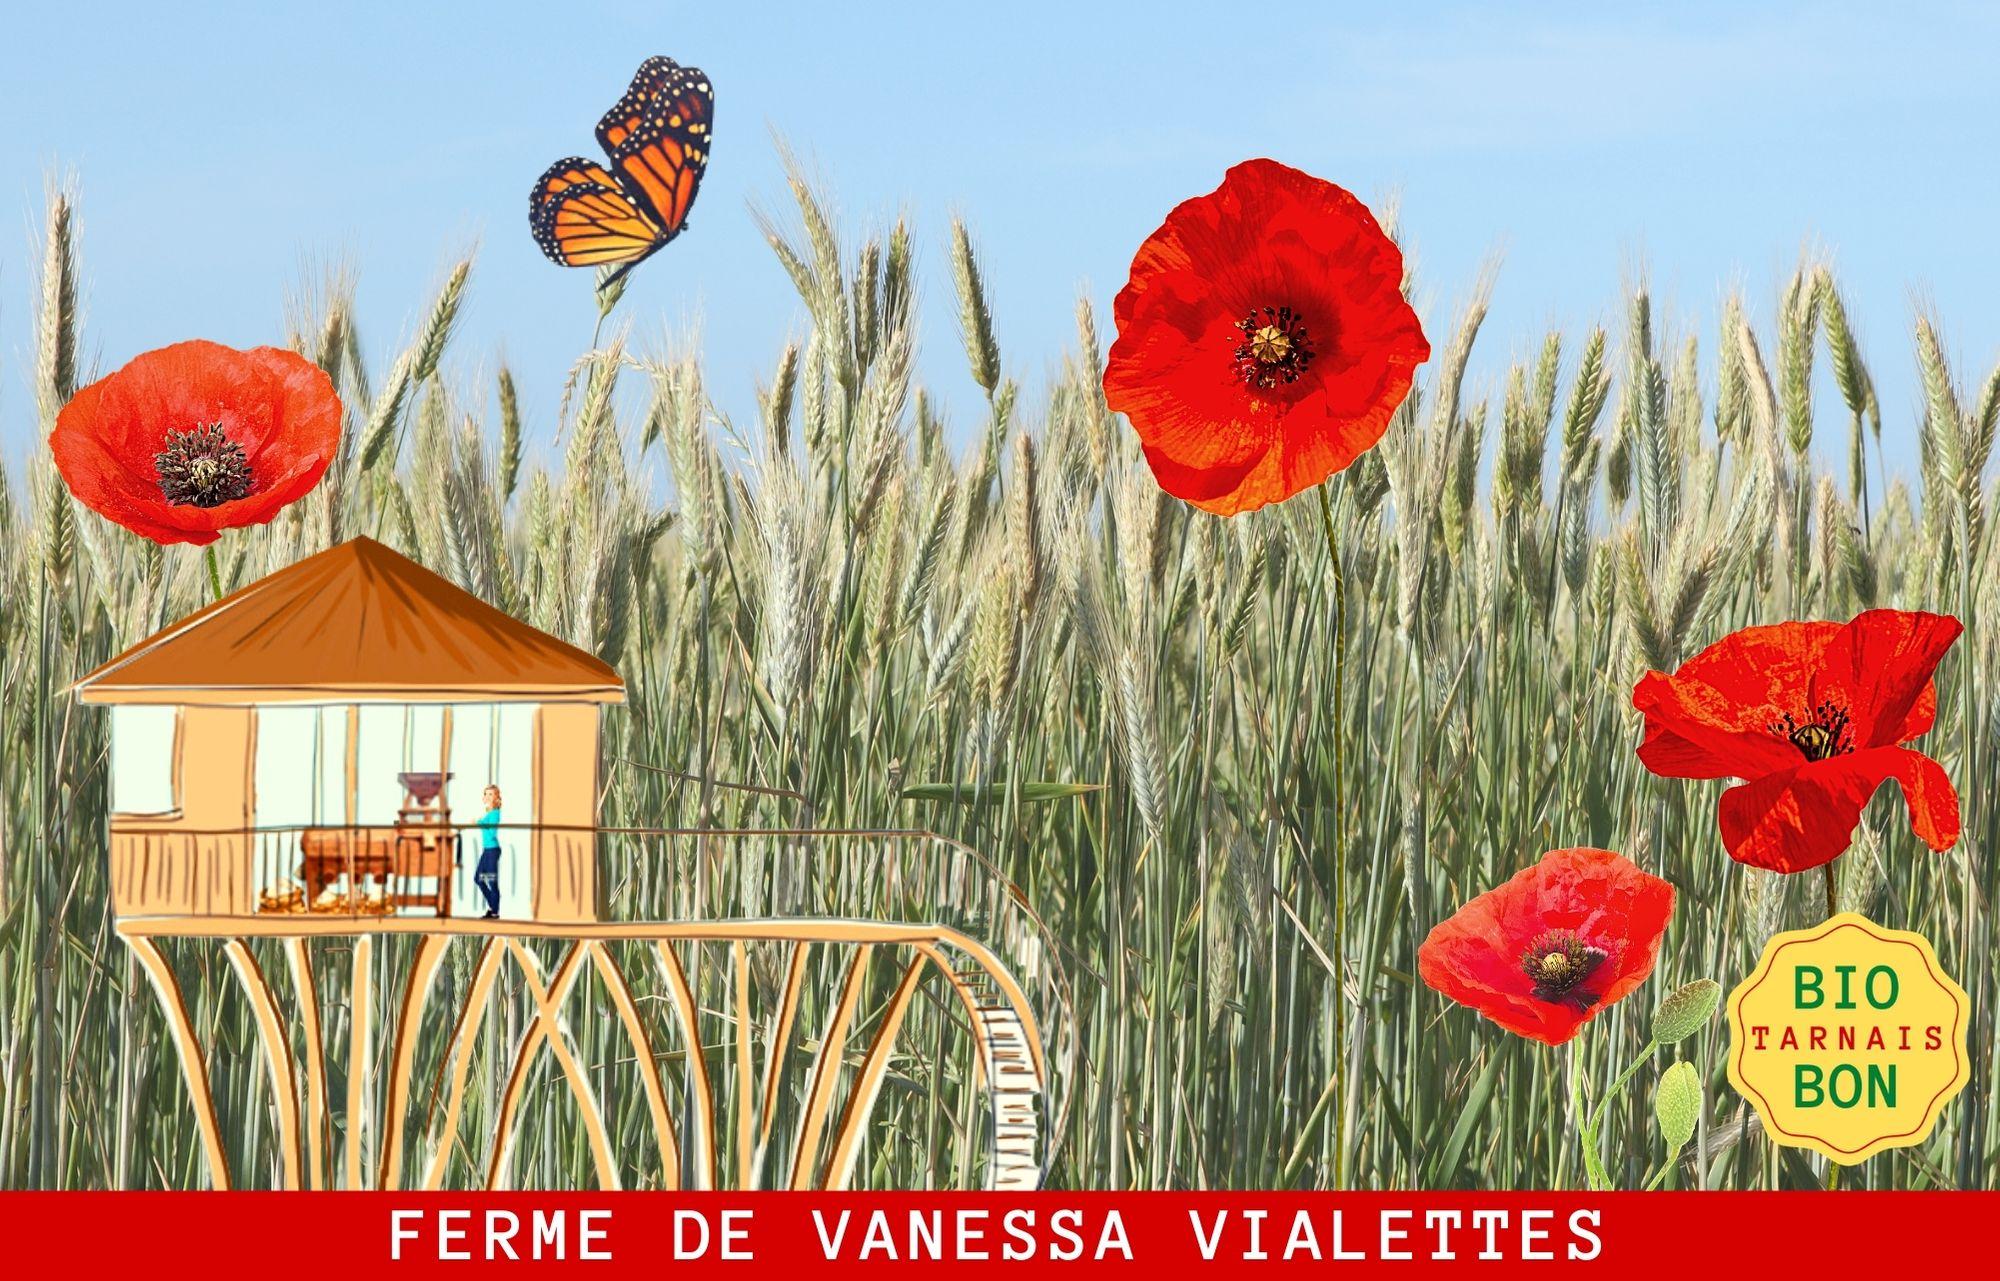 La Ferme de Vanessa